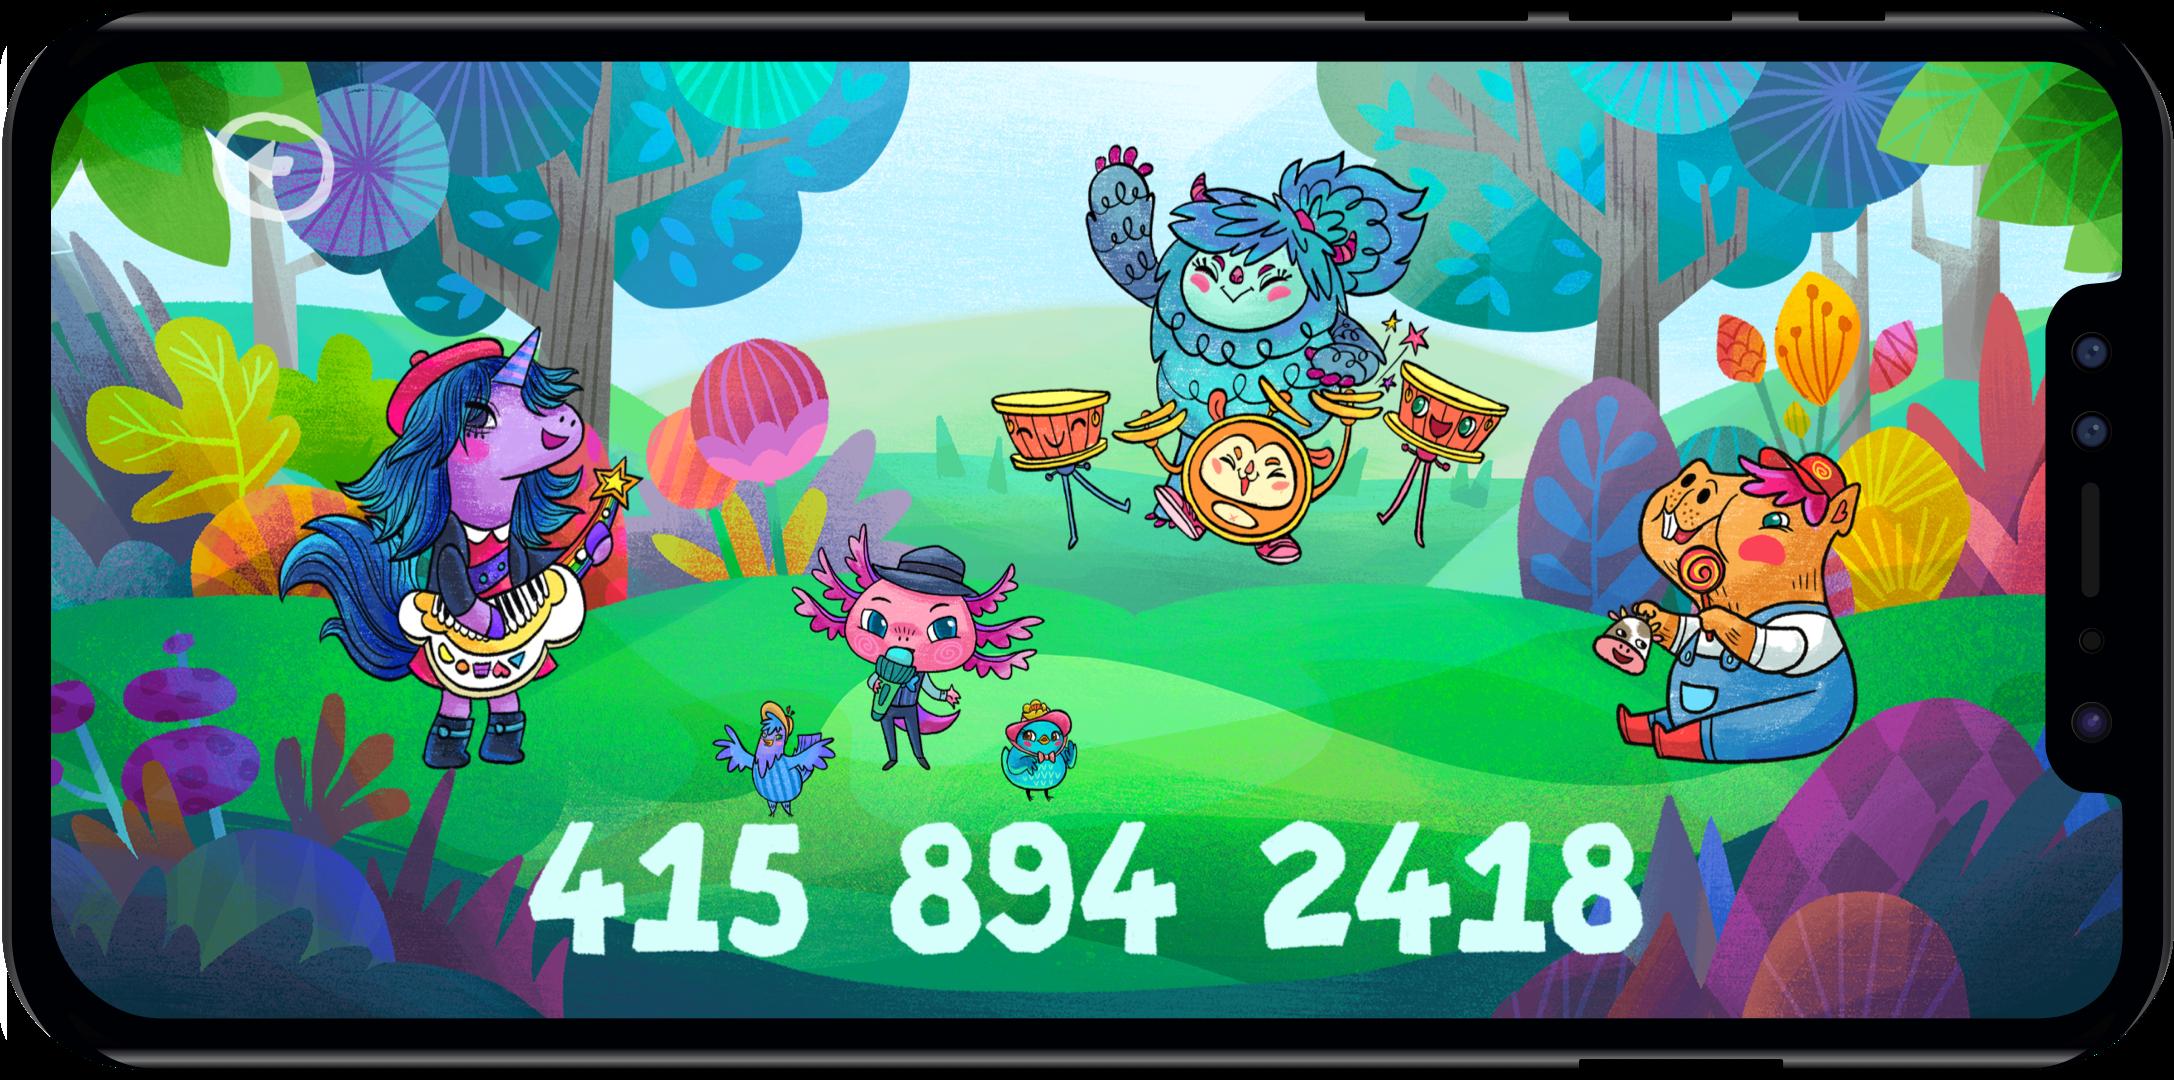 Teach phone number to kids